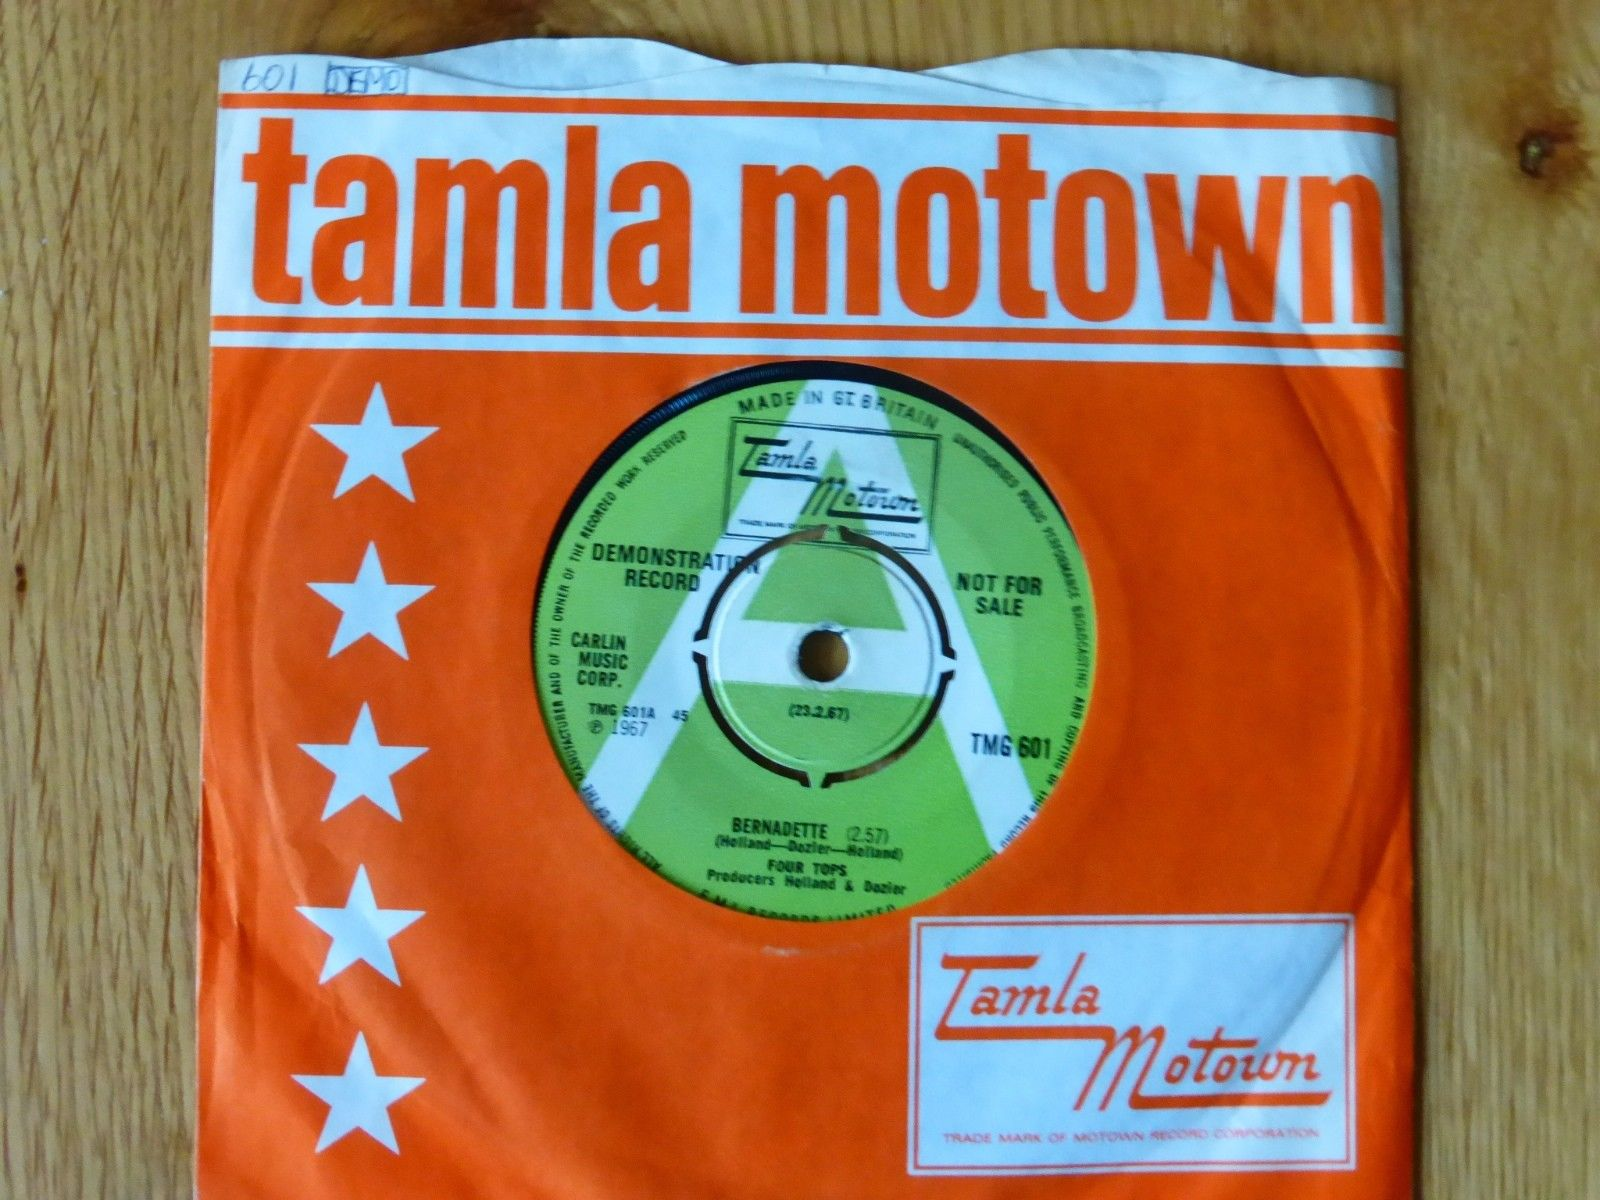 THE FOUR TOPS BERNADETTE / I GOT A FEELING [ DEMO ] TMG 601 1967